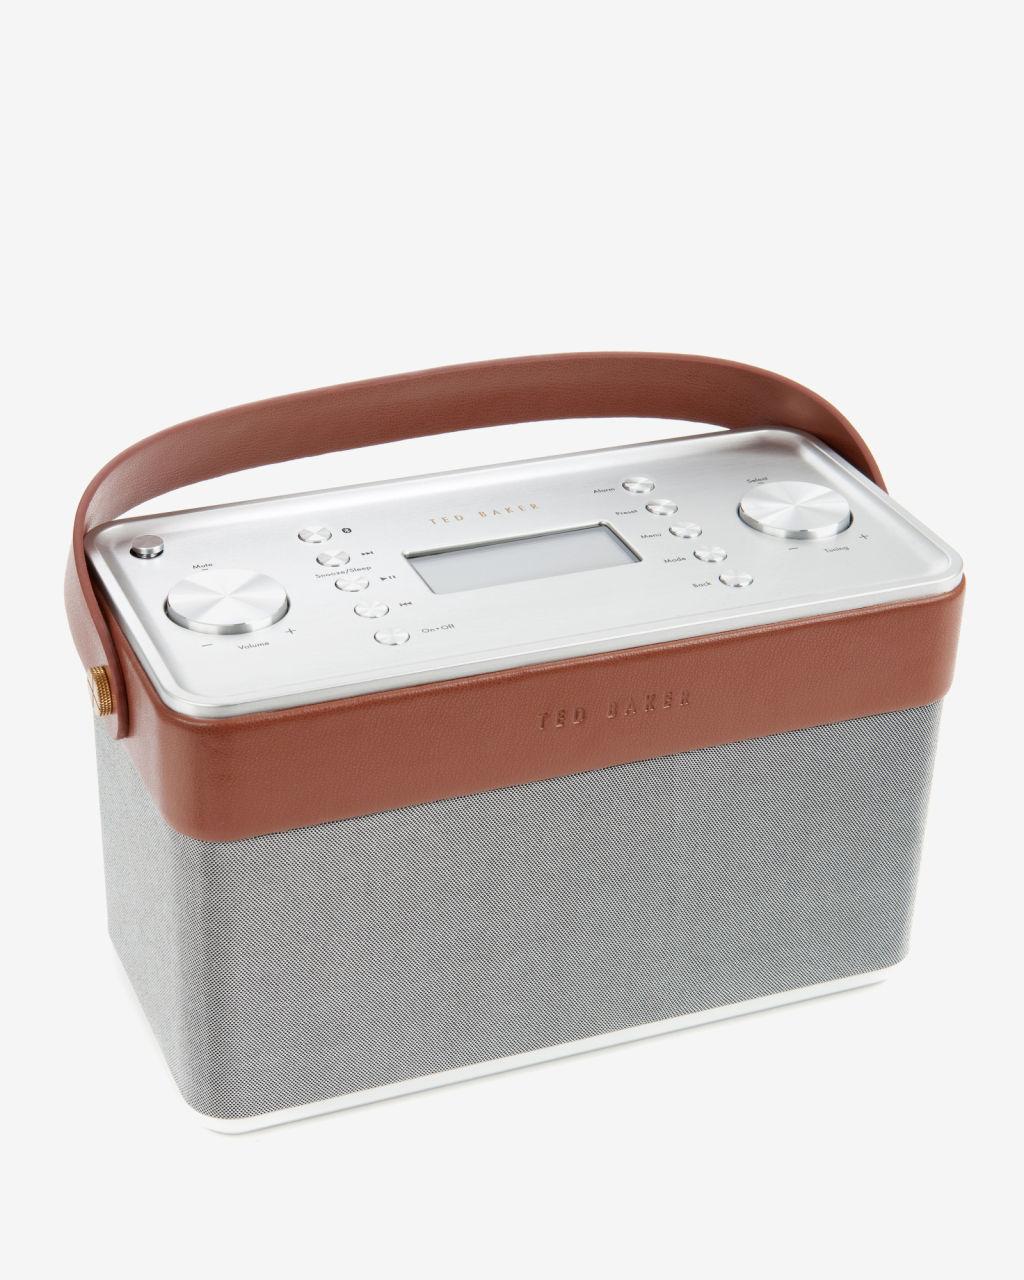 uk-Mens-Gifts-Gifts-for-him-FINISTR-DAB-radio-Tan-DA4M_FINISTR_27-TAN_1.jpg